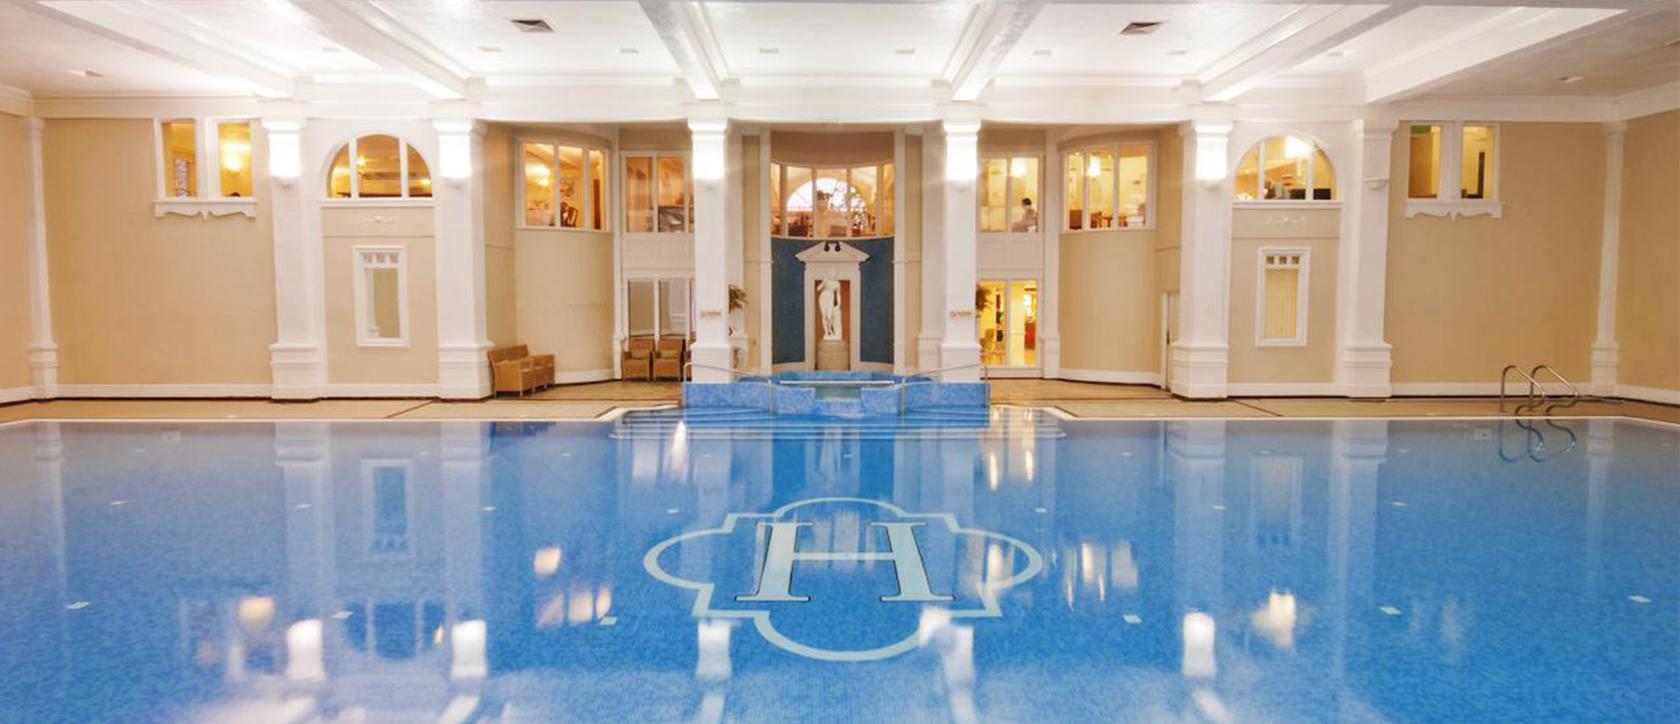 Champneys Luxury Spa Hotel, Henlow - 1